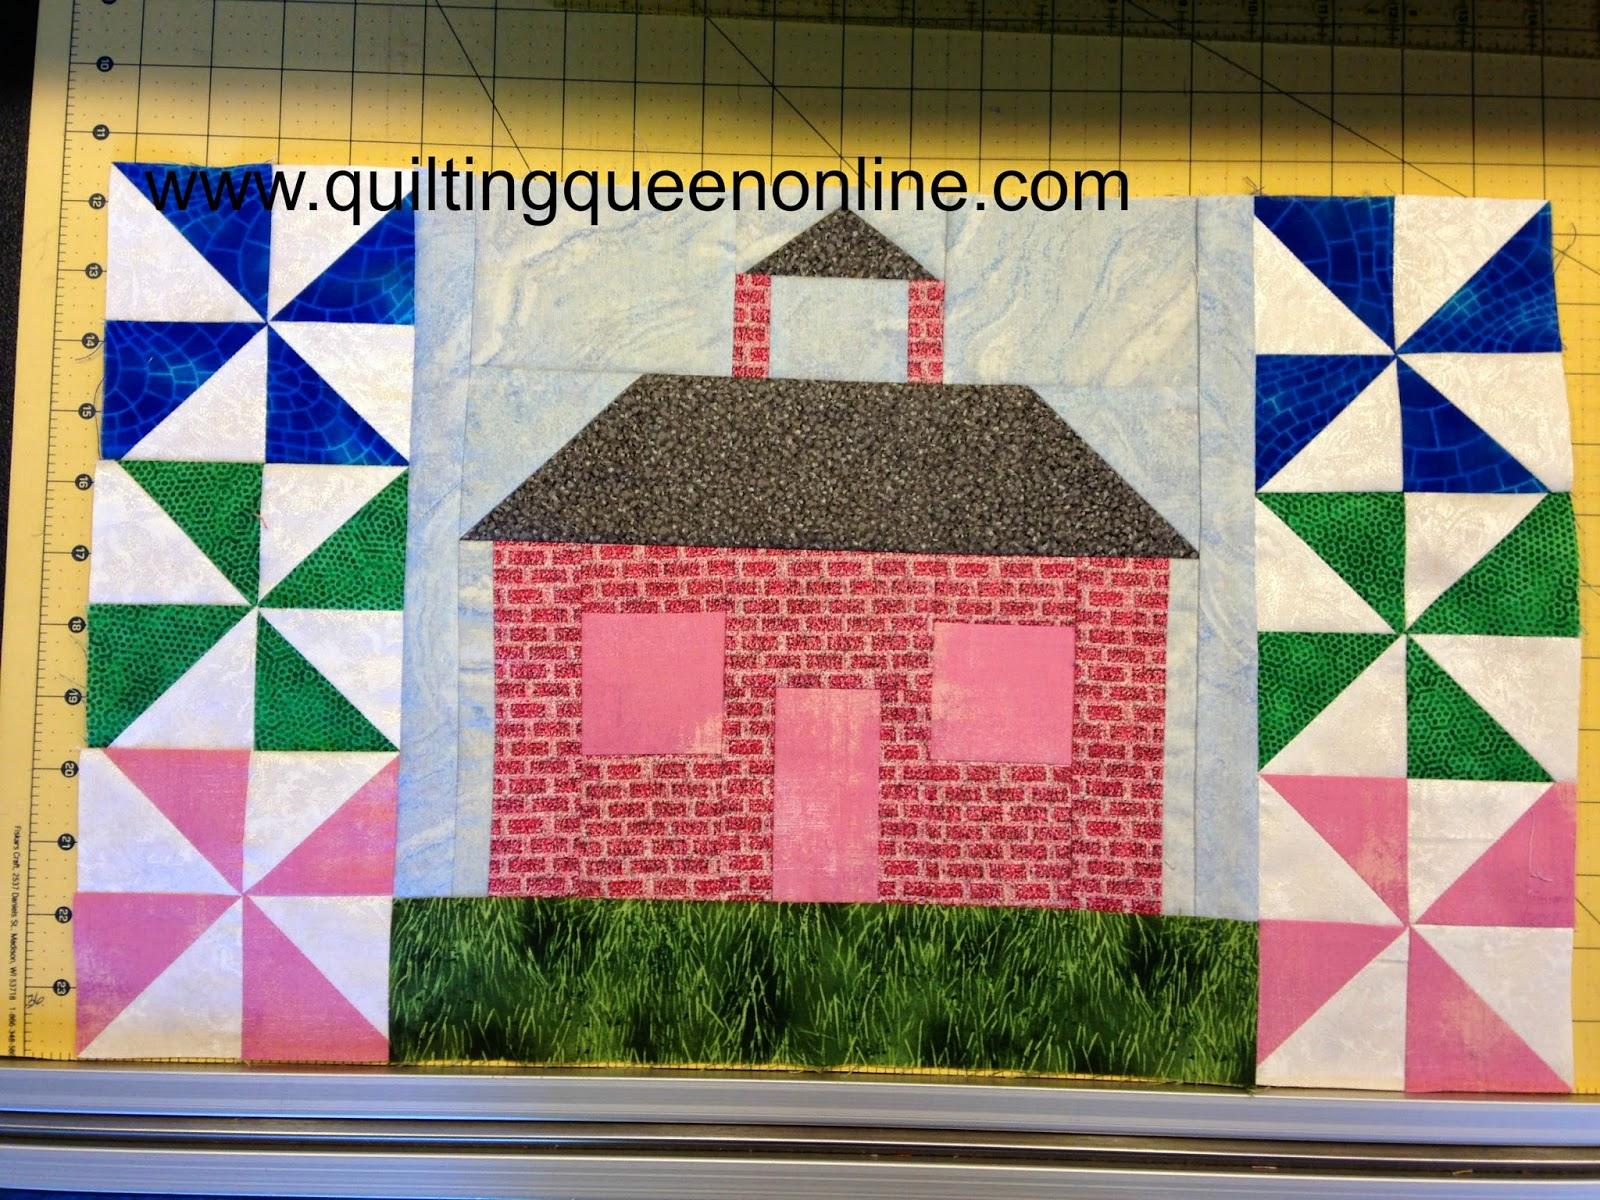 MYSTERY SEASONAL SAMPLER SEPTEMBER 2014 | The Quilting Queen Online